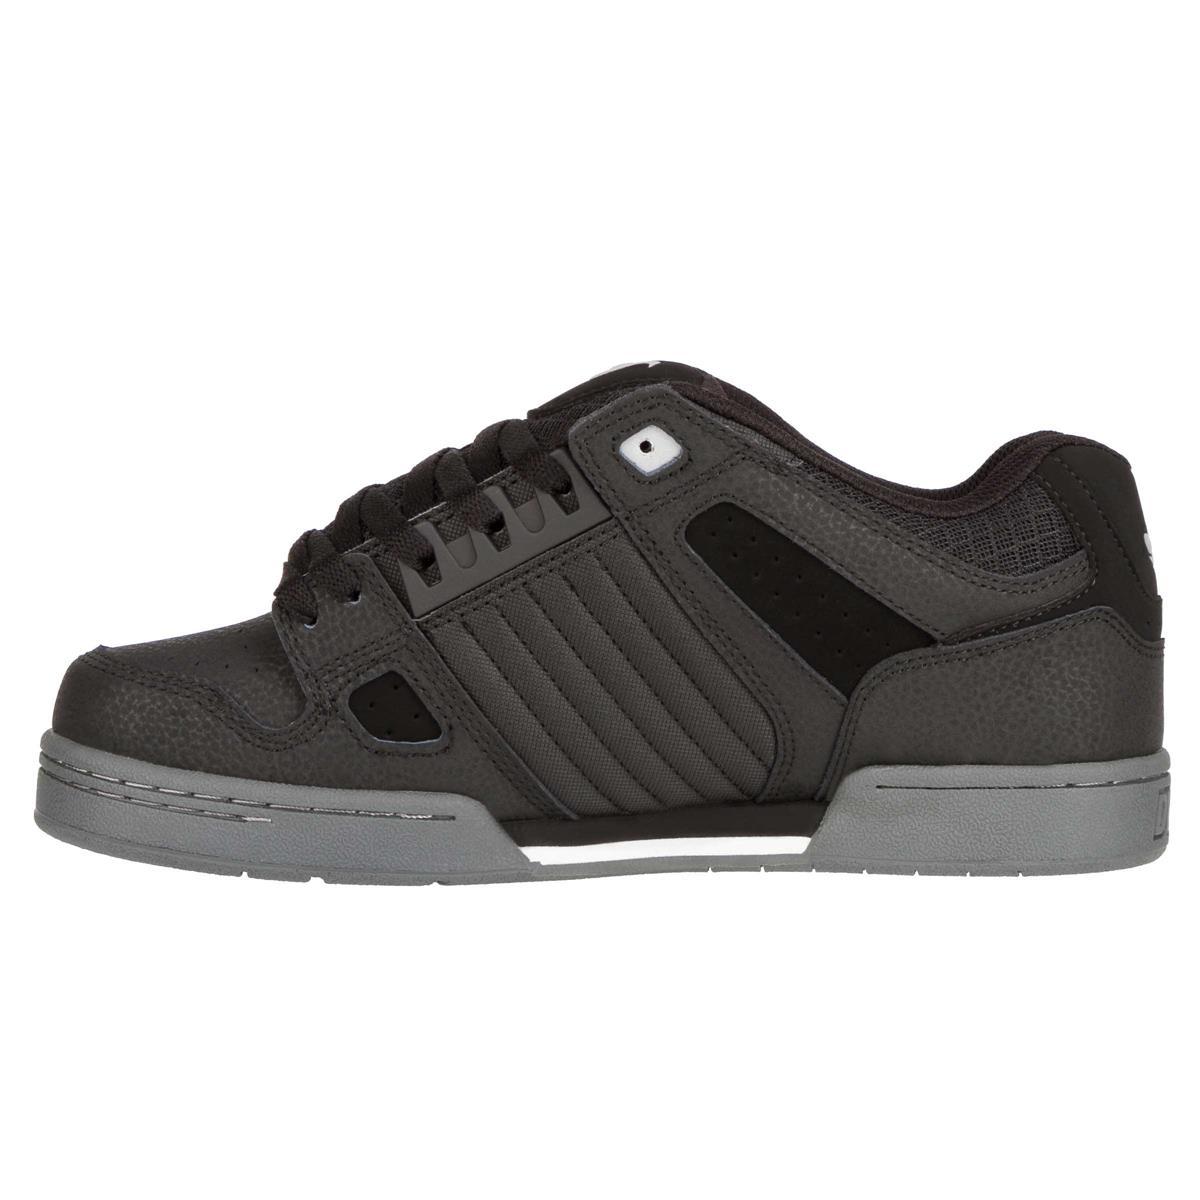 DVS Schuhe Celsius SchwarzCharcoalWeiß Nubuk